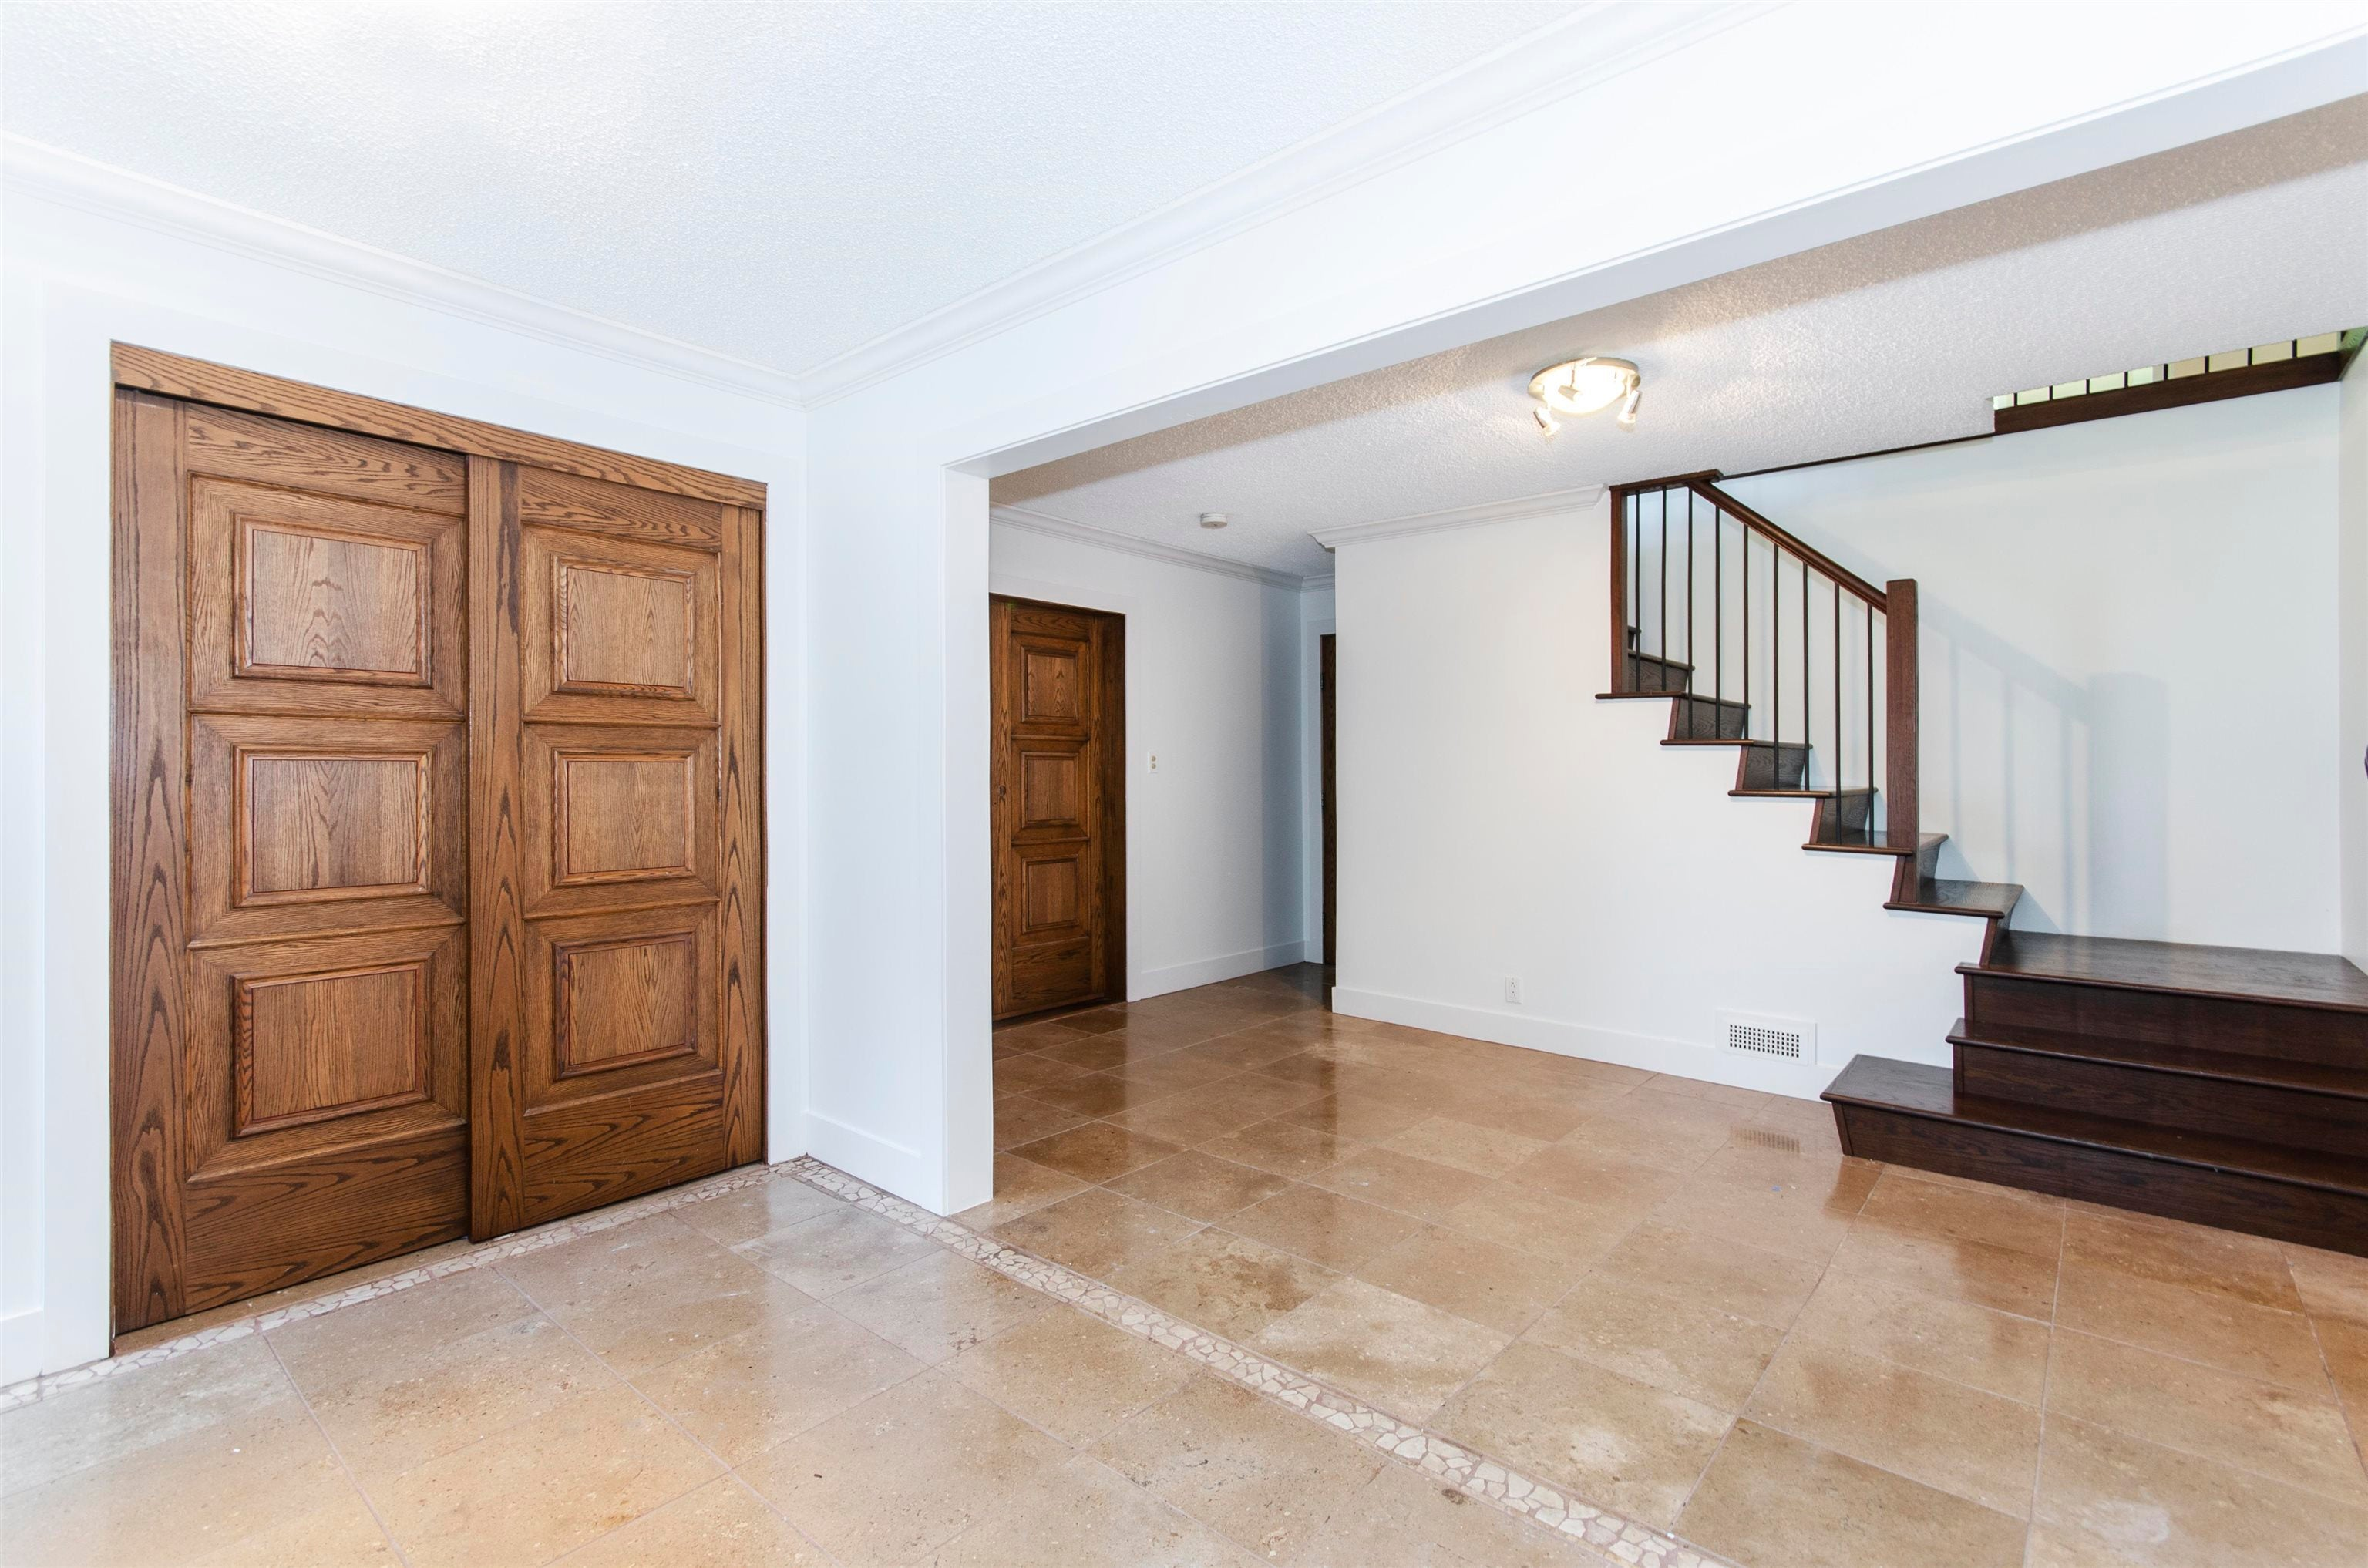 3785 REGENT AVENUE - Upper Lonsdale House/Single Family for sale, 4 Bedrooms (R2617648) - #2